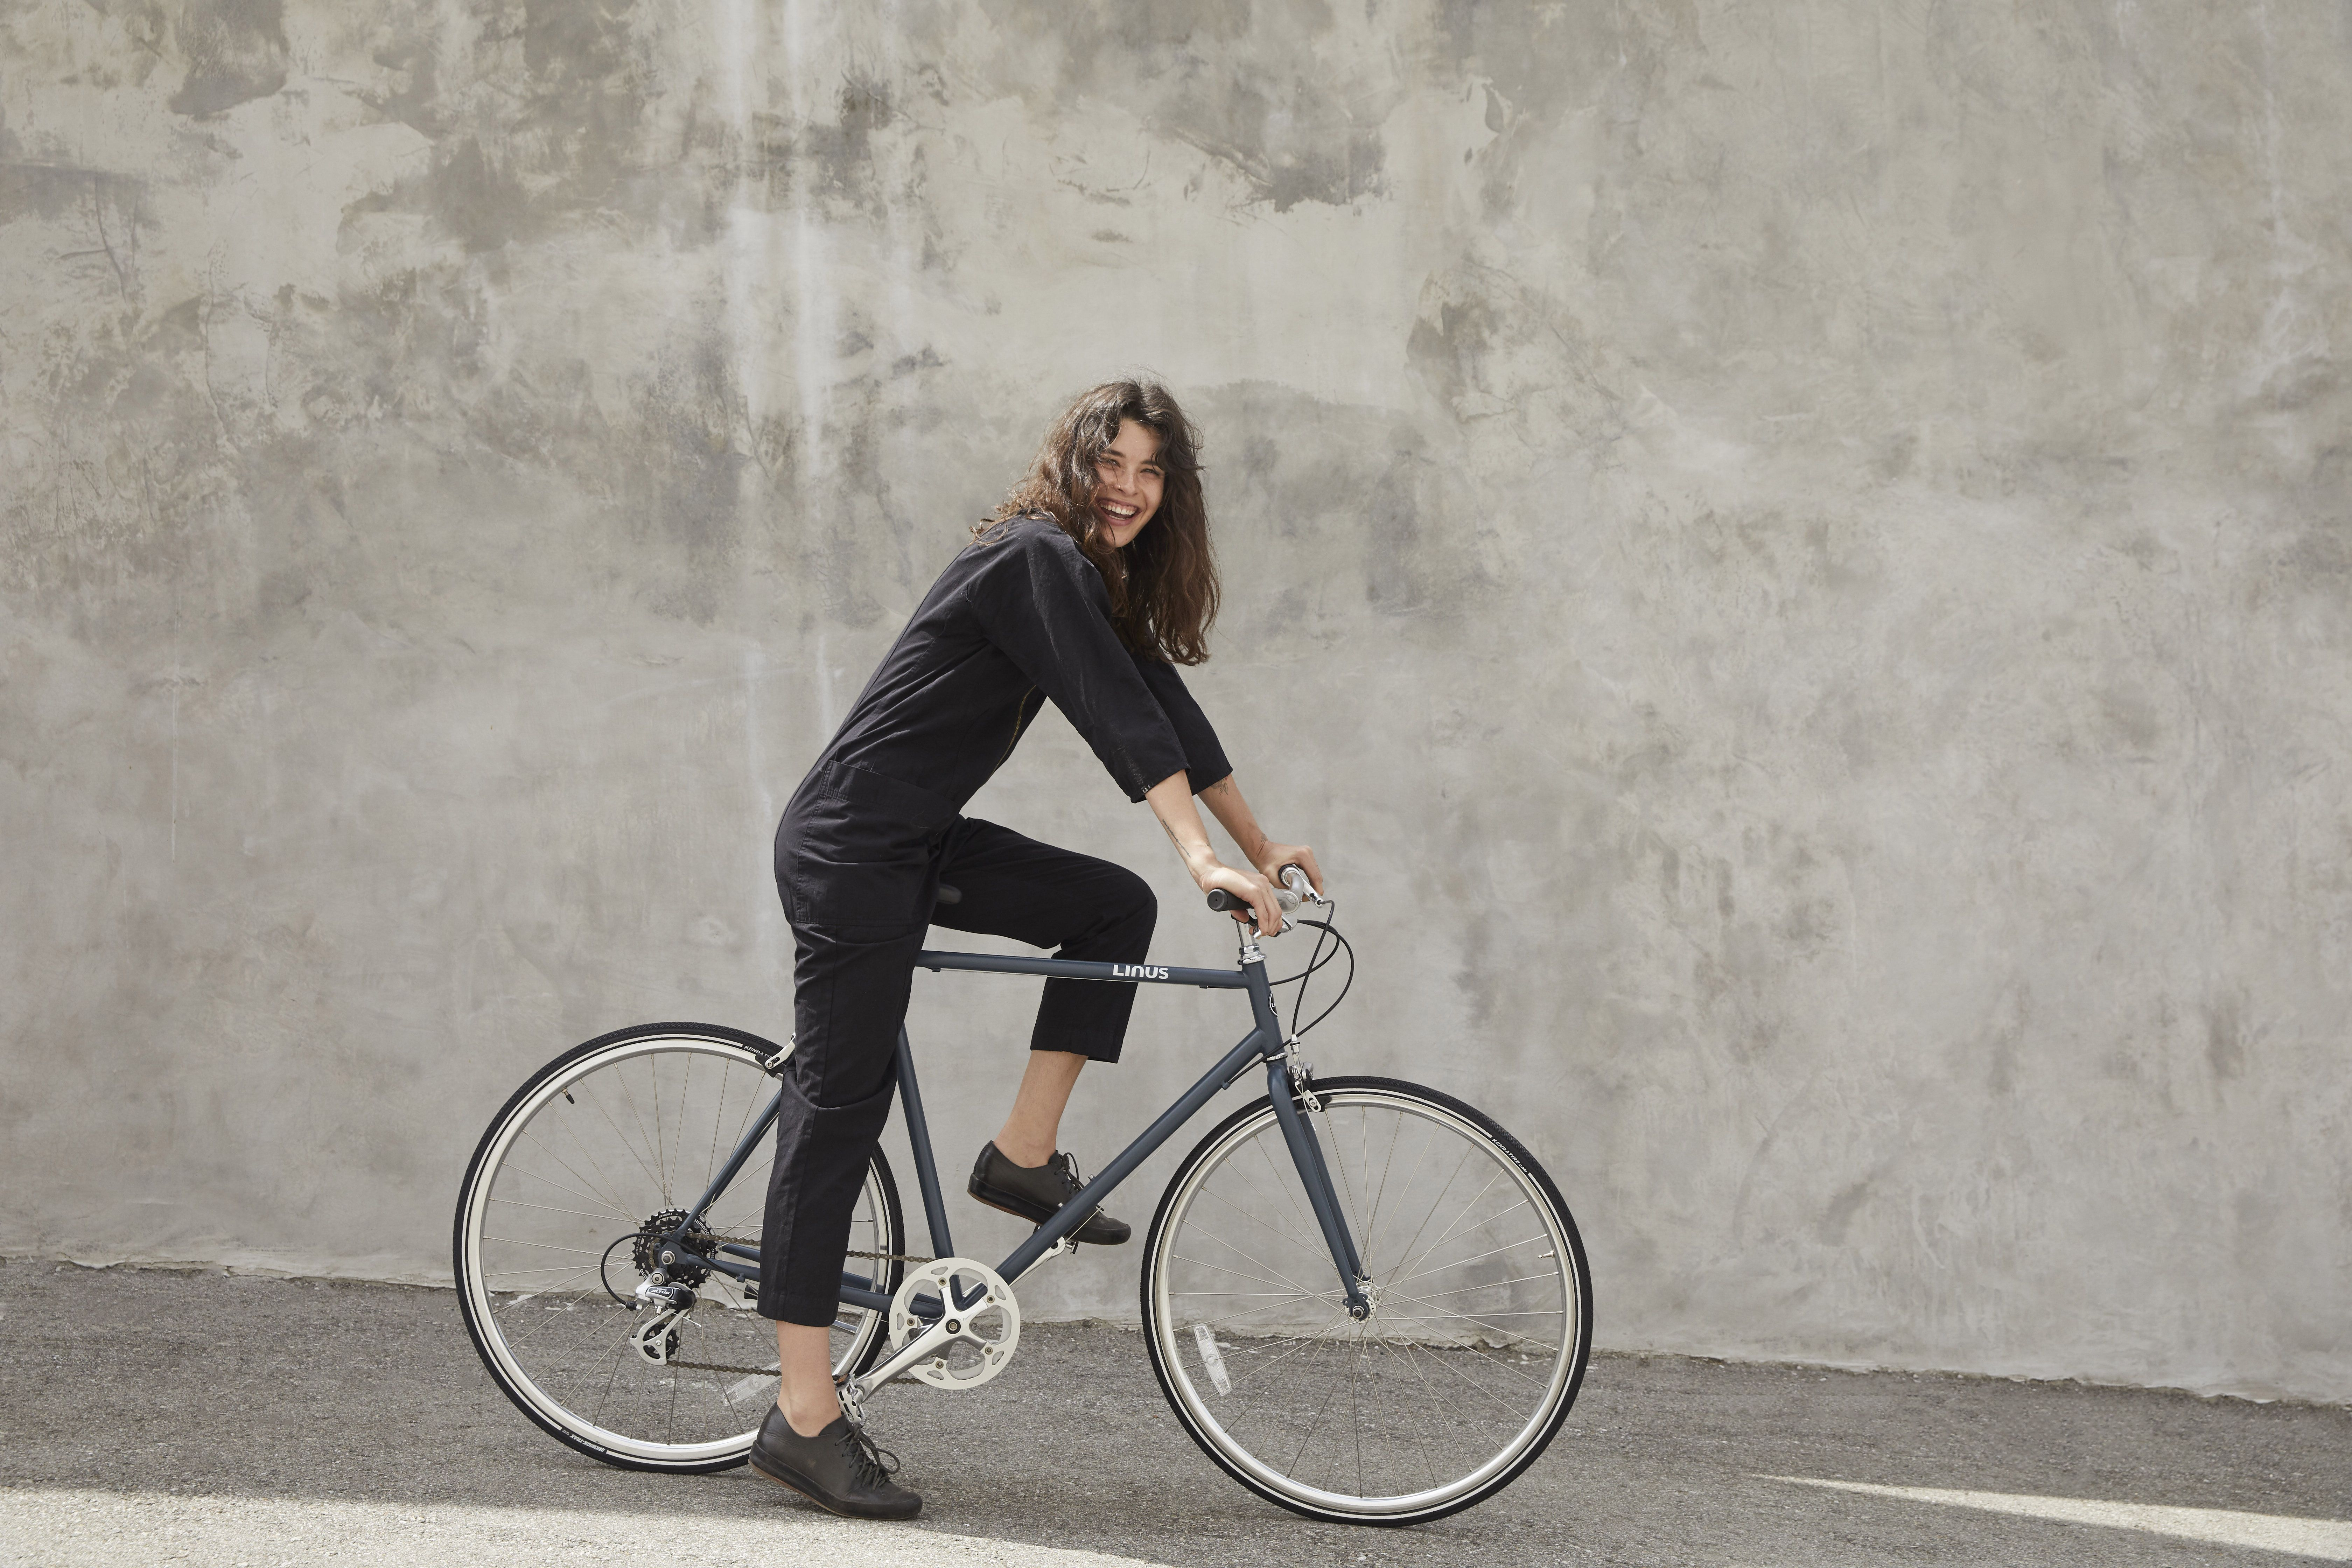 Altore 7 Bike Commuter Bike Bikes Girls